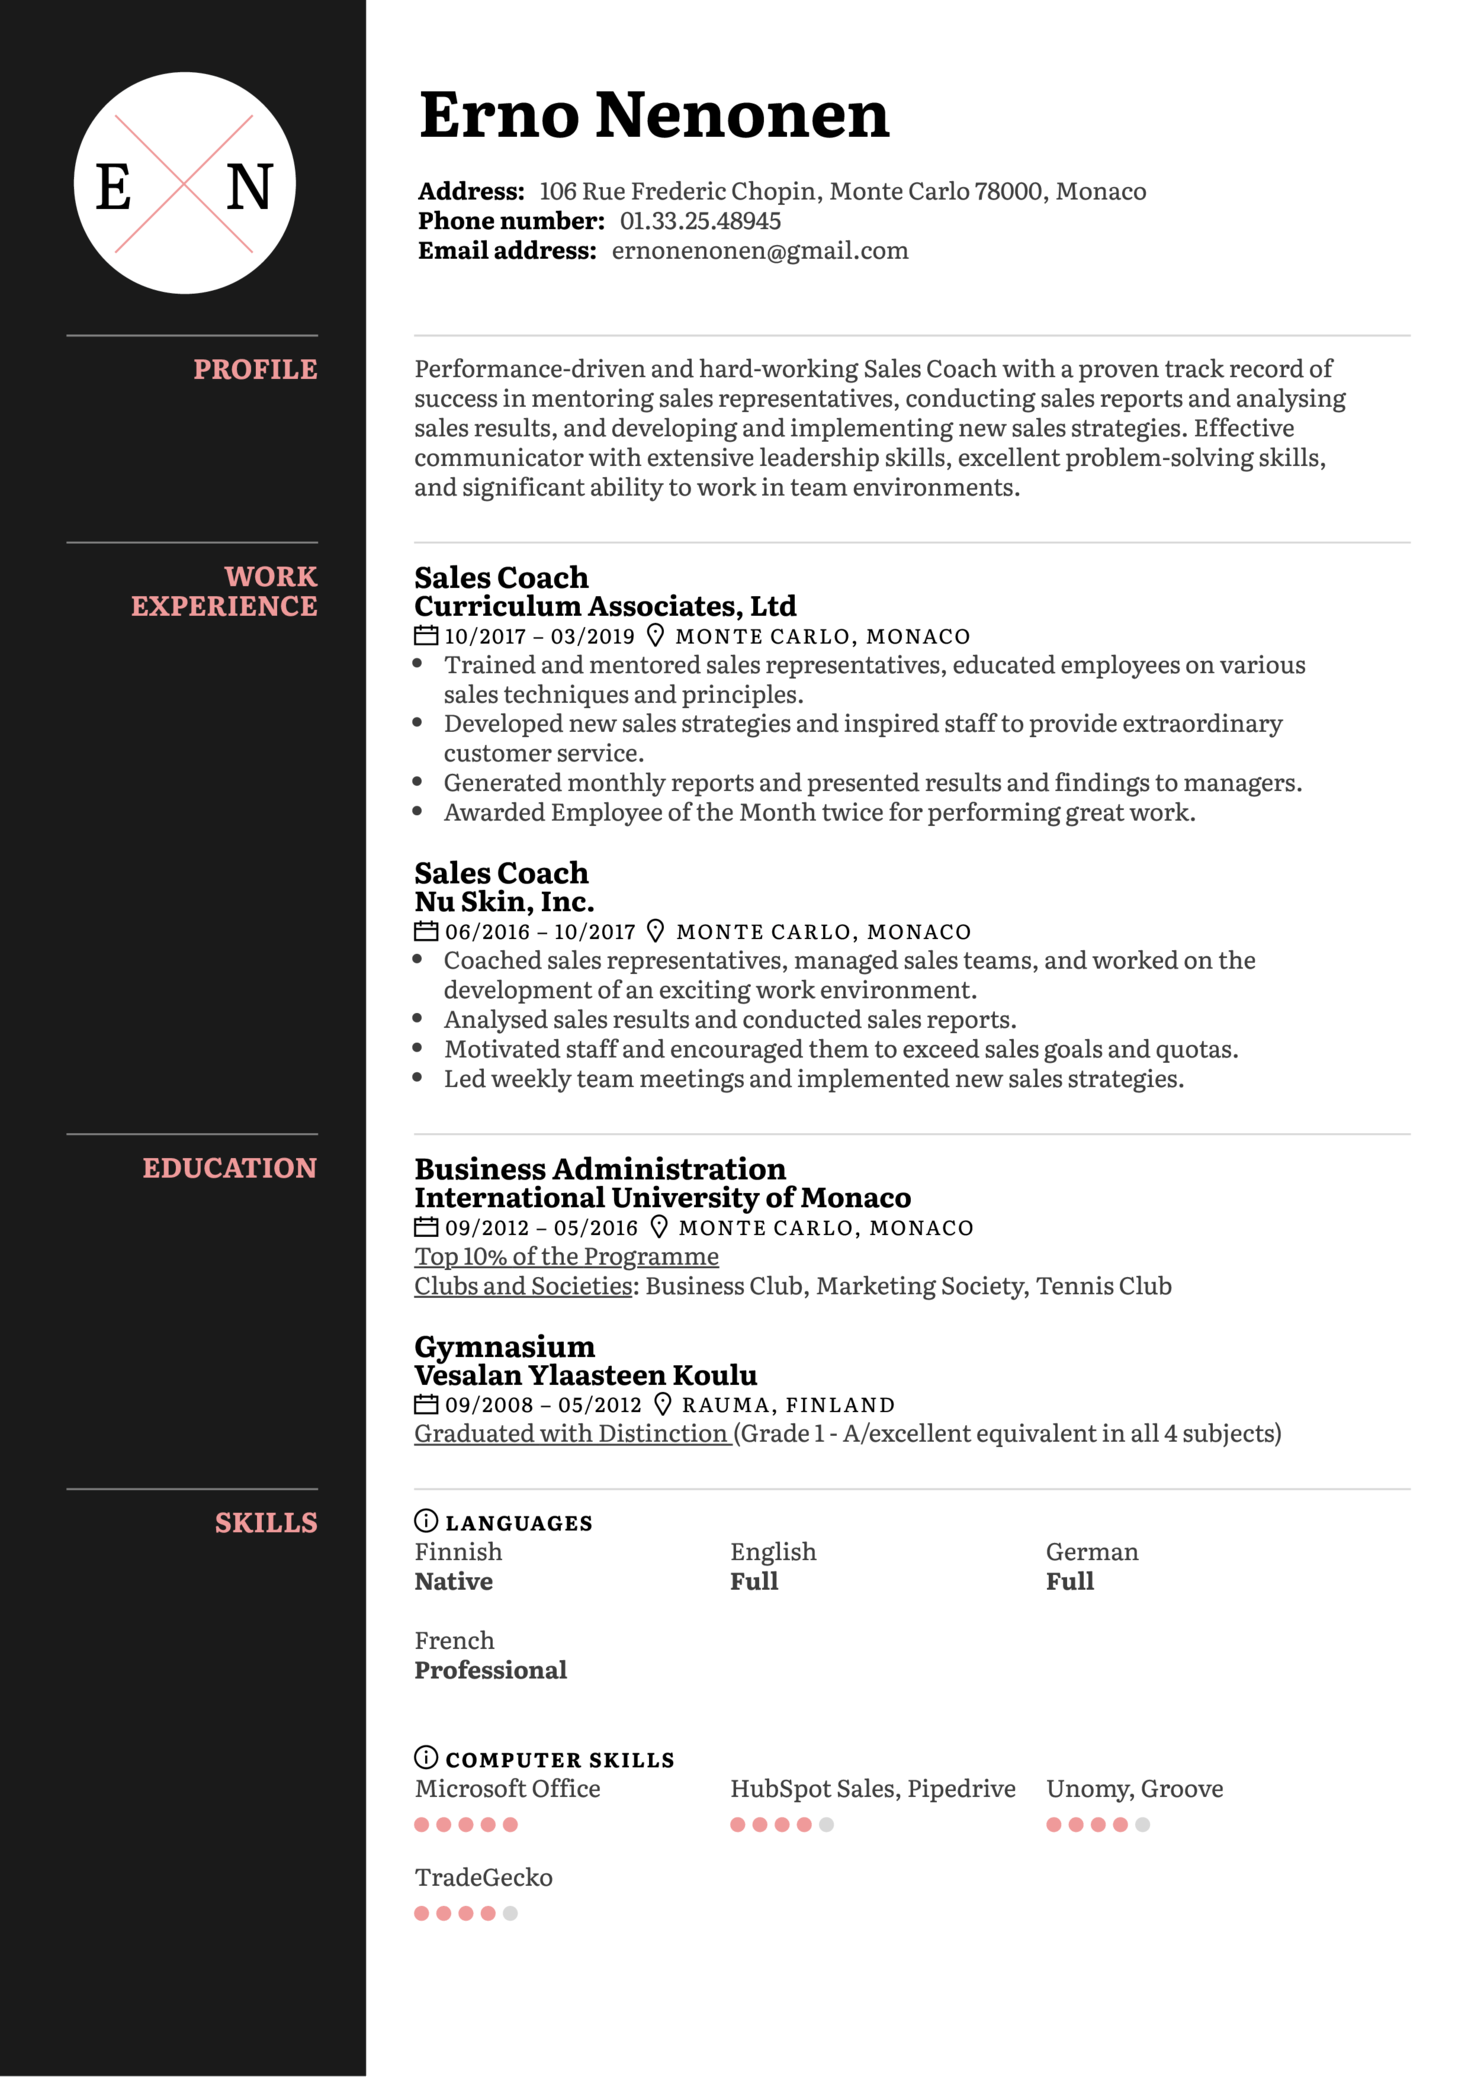 Sales Coach Resume Sample (parte 1)